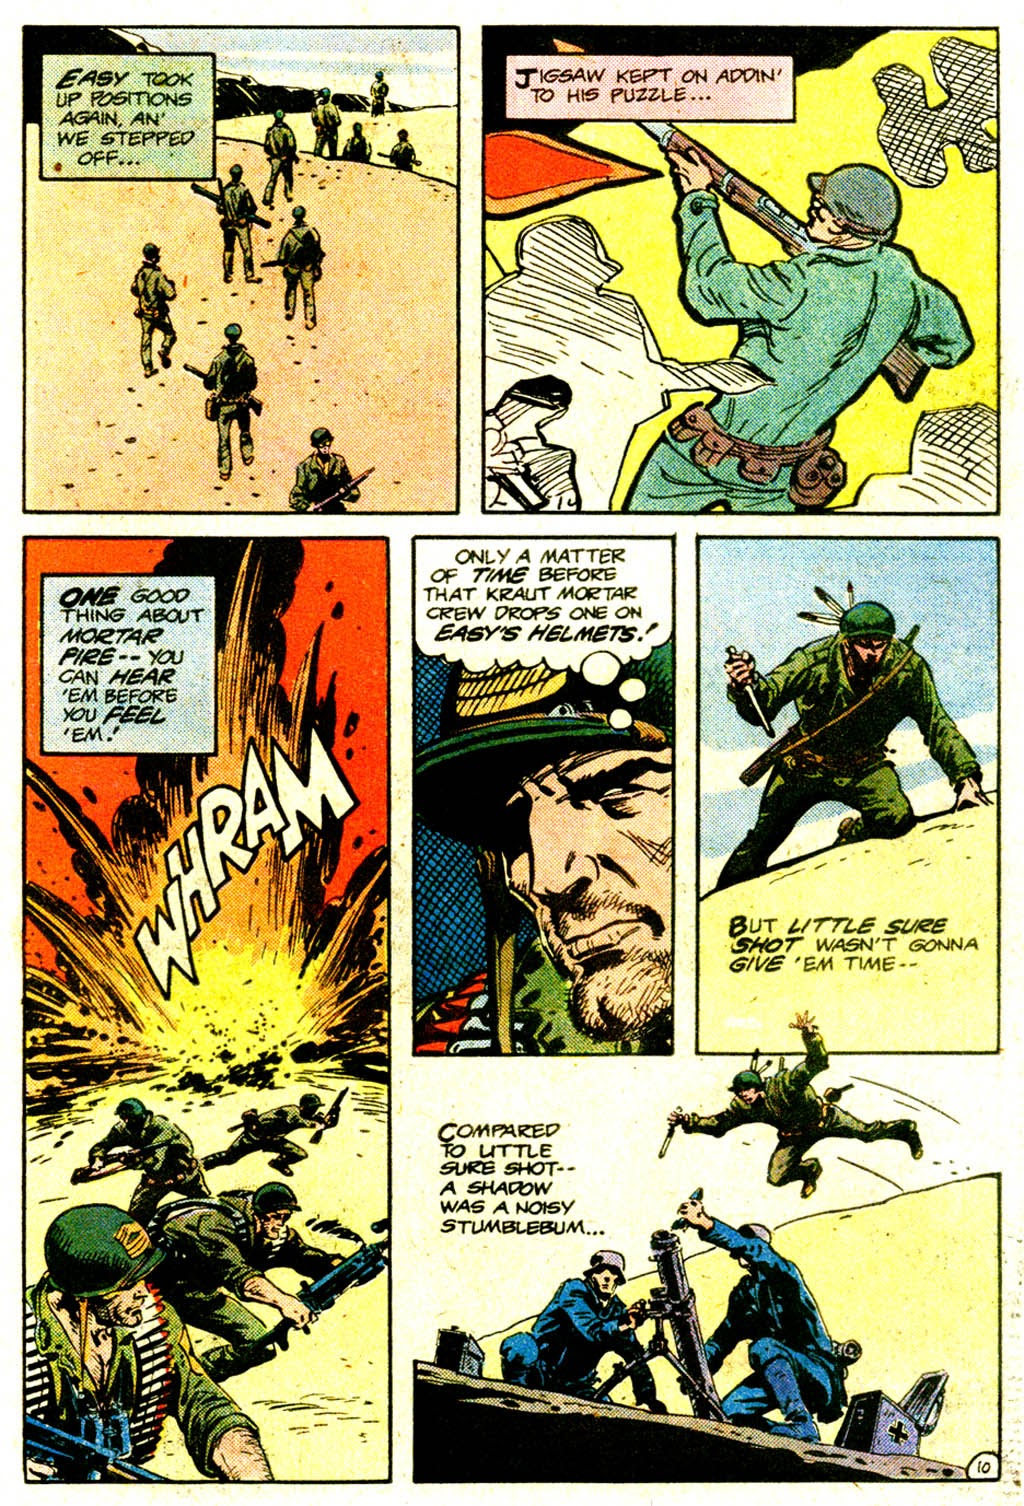 Read online Sgt. Rock comic -  Issue #365 - 14